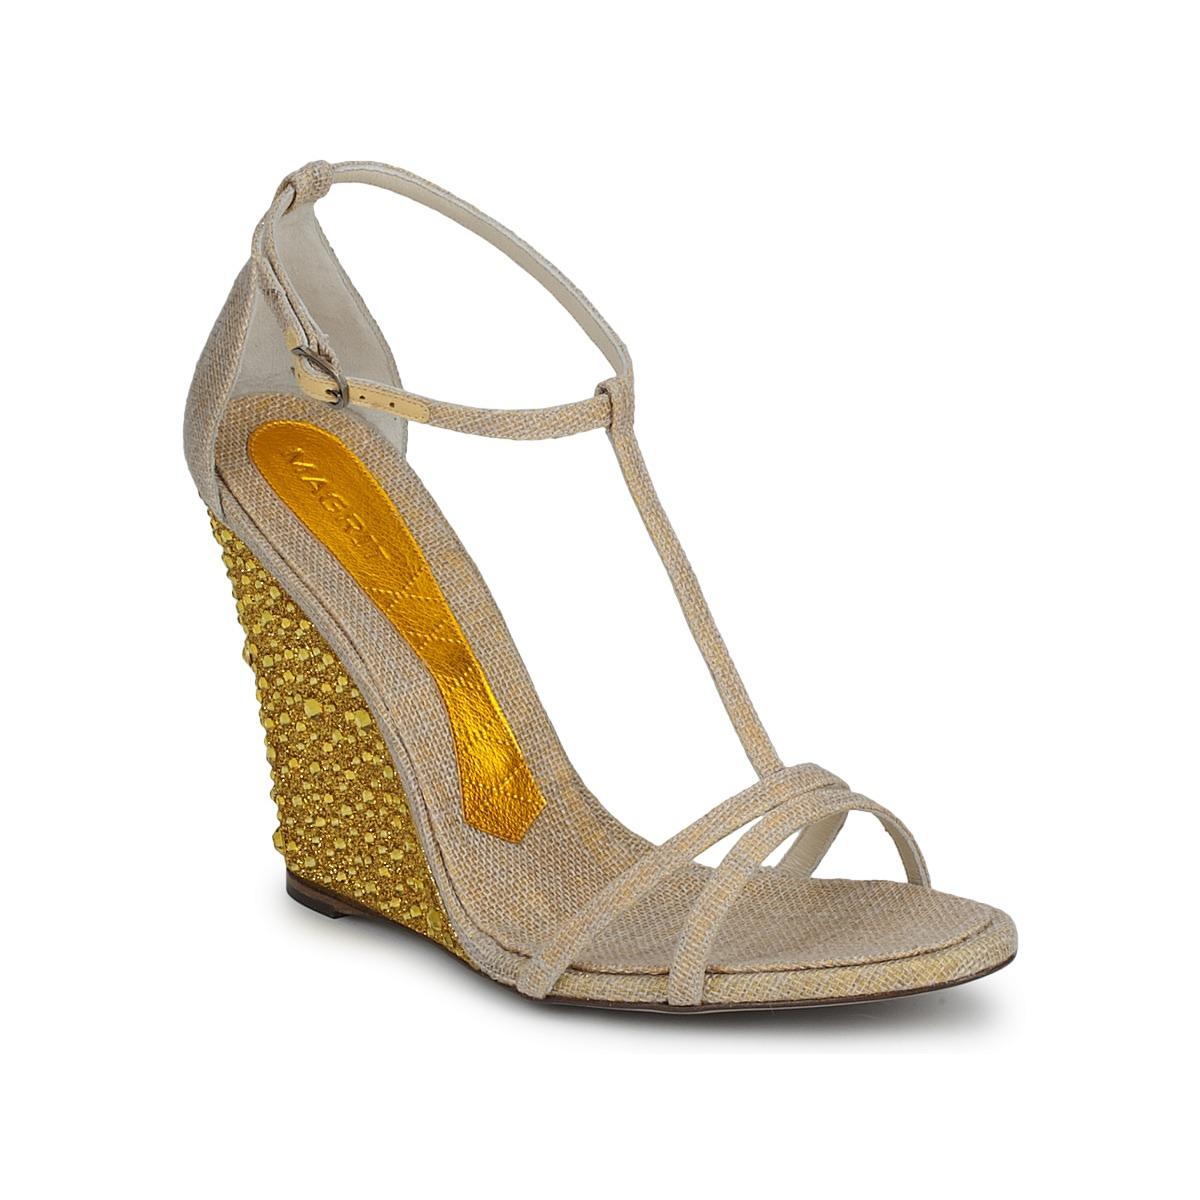 Magrit JOAQUINA Beige / Goldfarben - Kostenloser Versand bei Spartoode ! - Schuhe Sandalen / Sandaletten Damen 172,50 €